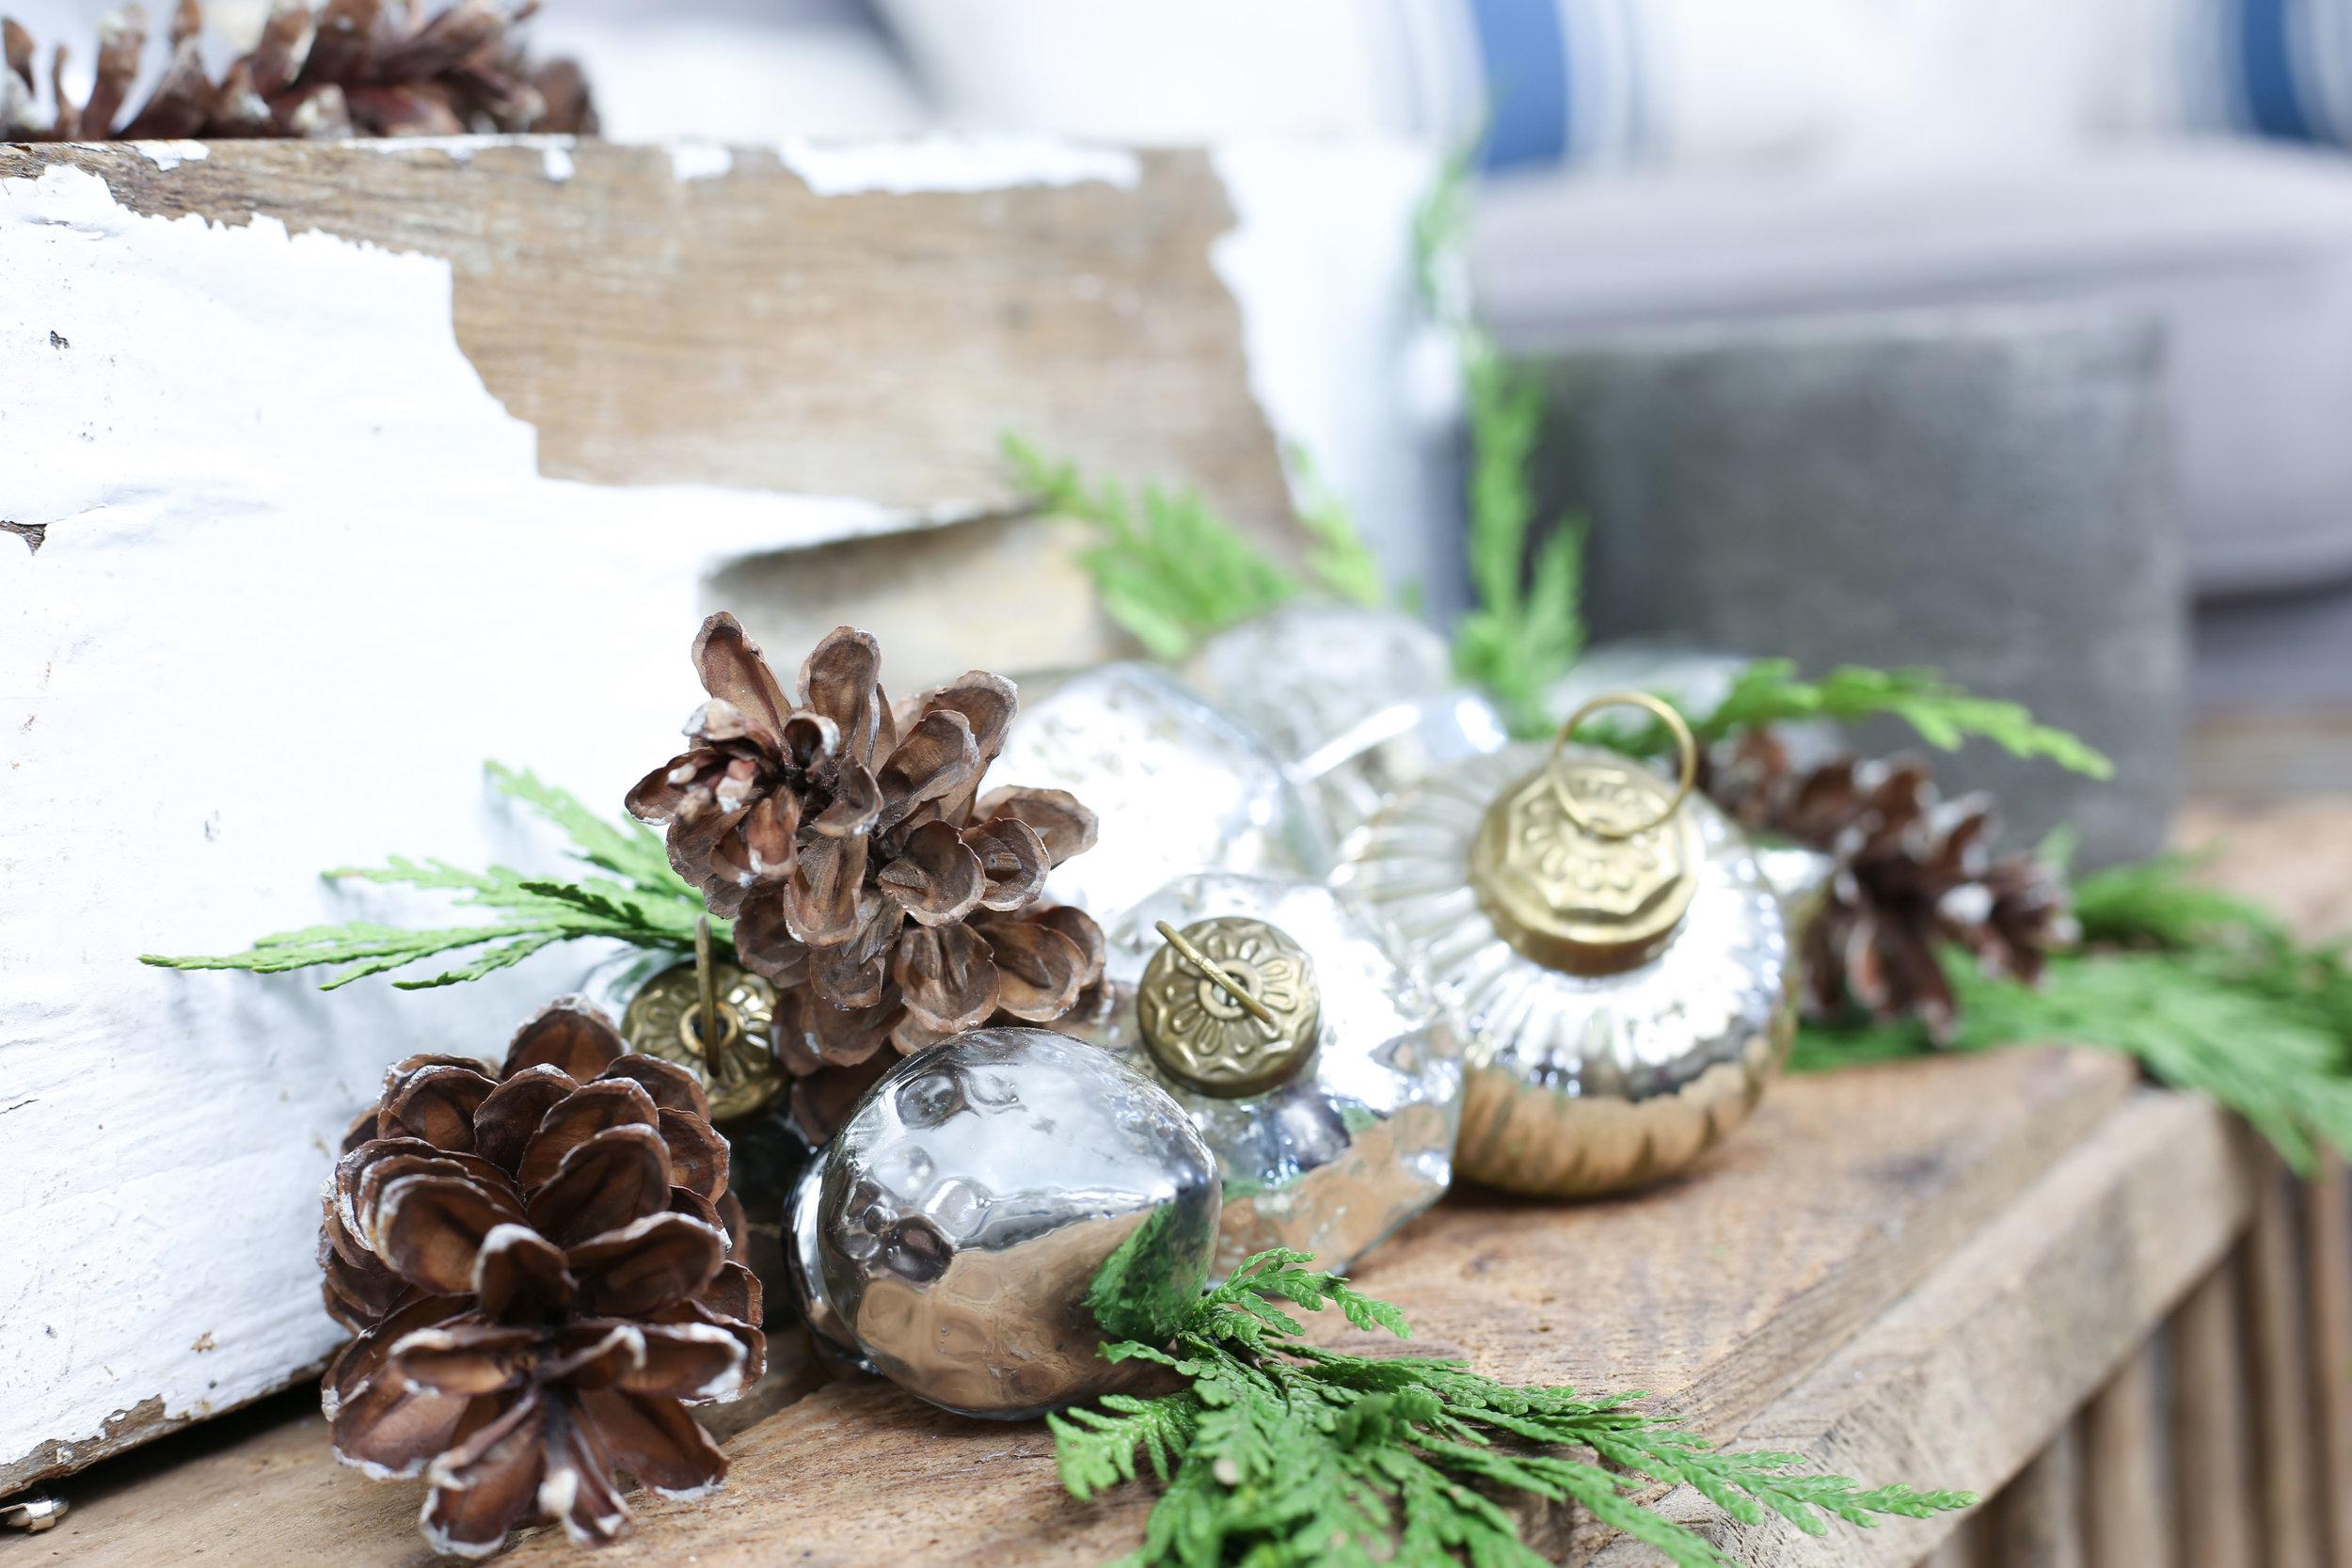 Christmas 2017 Home Tour: Deck The Blogs- Neutral Decor Mercury Glass Ornaments- Plum Pretty Decor & Design's Christmas Home Tour